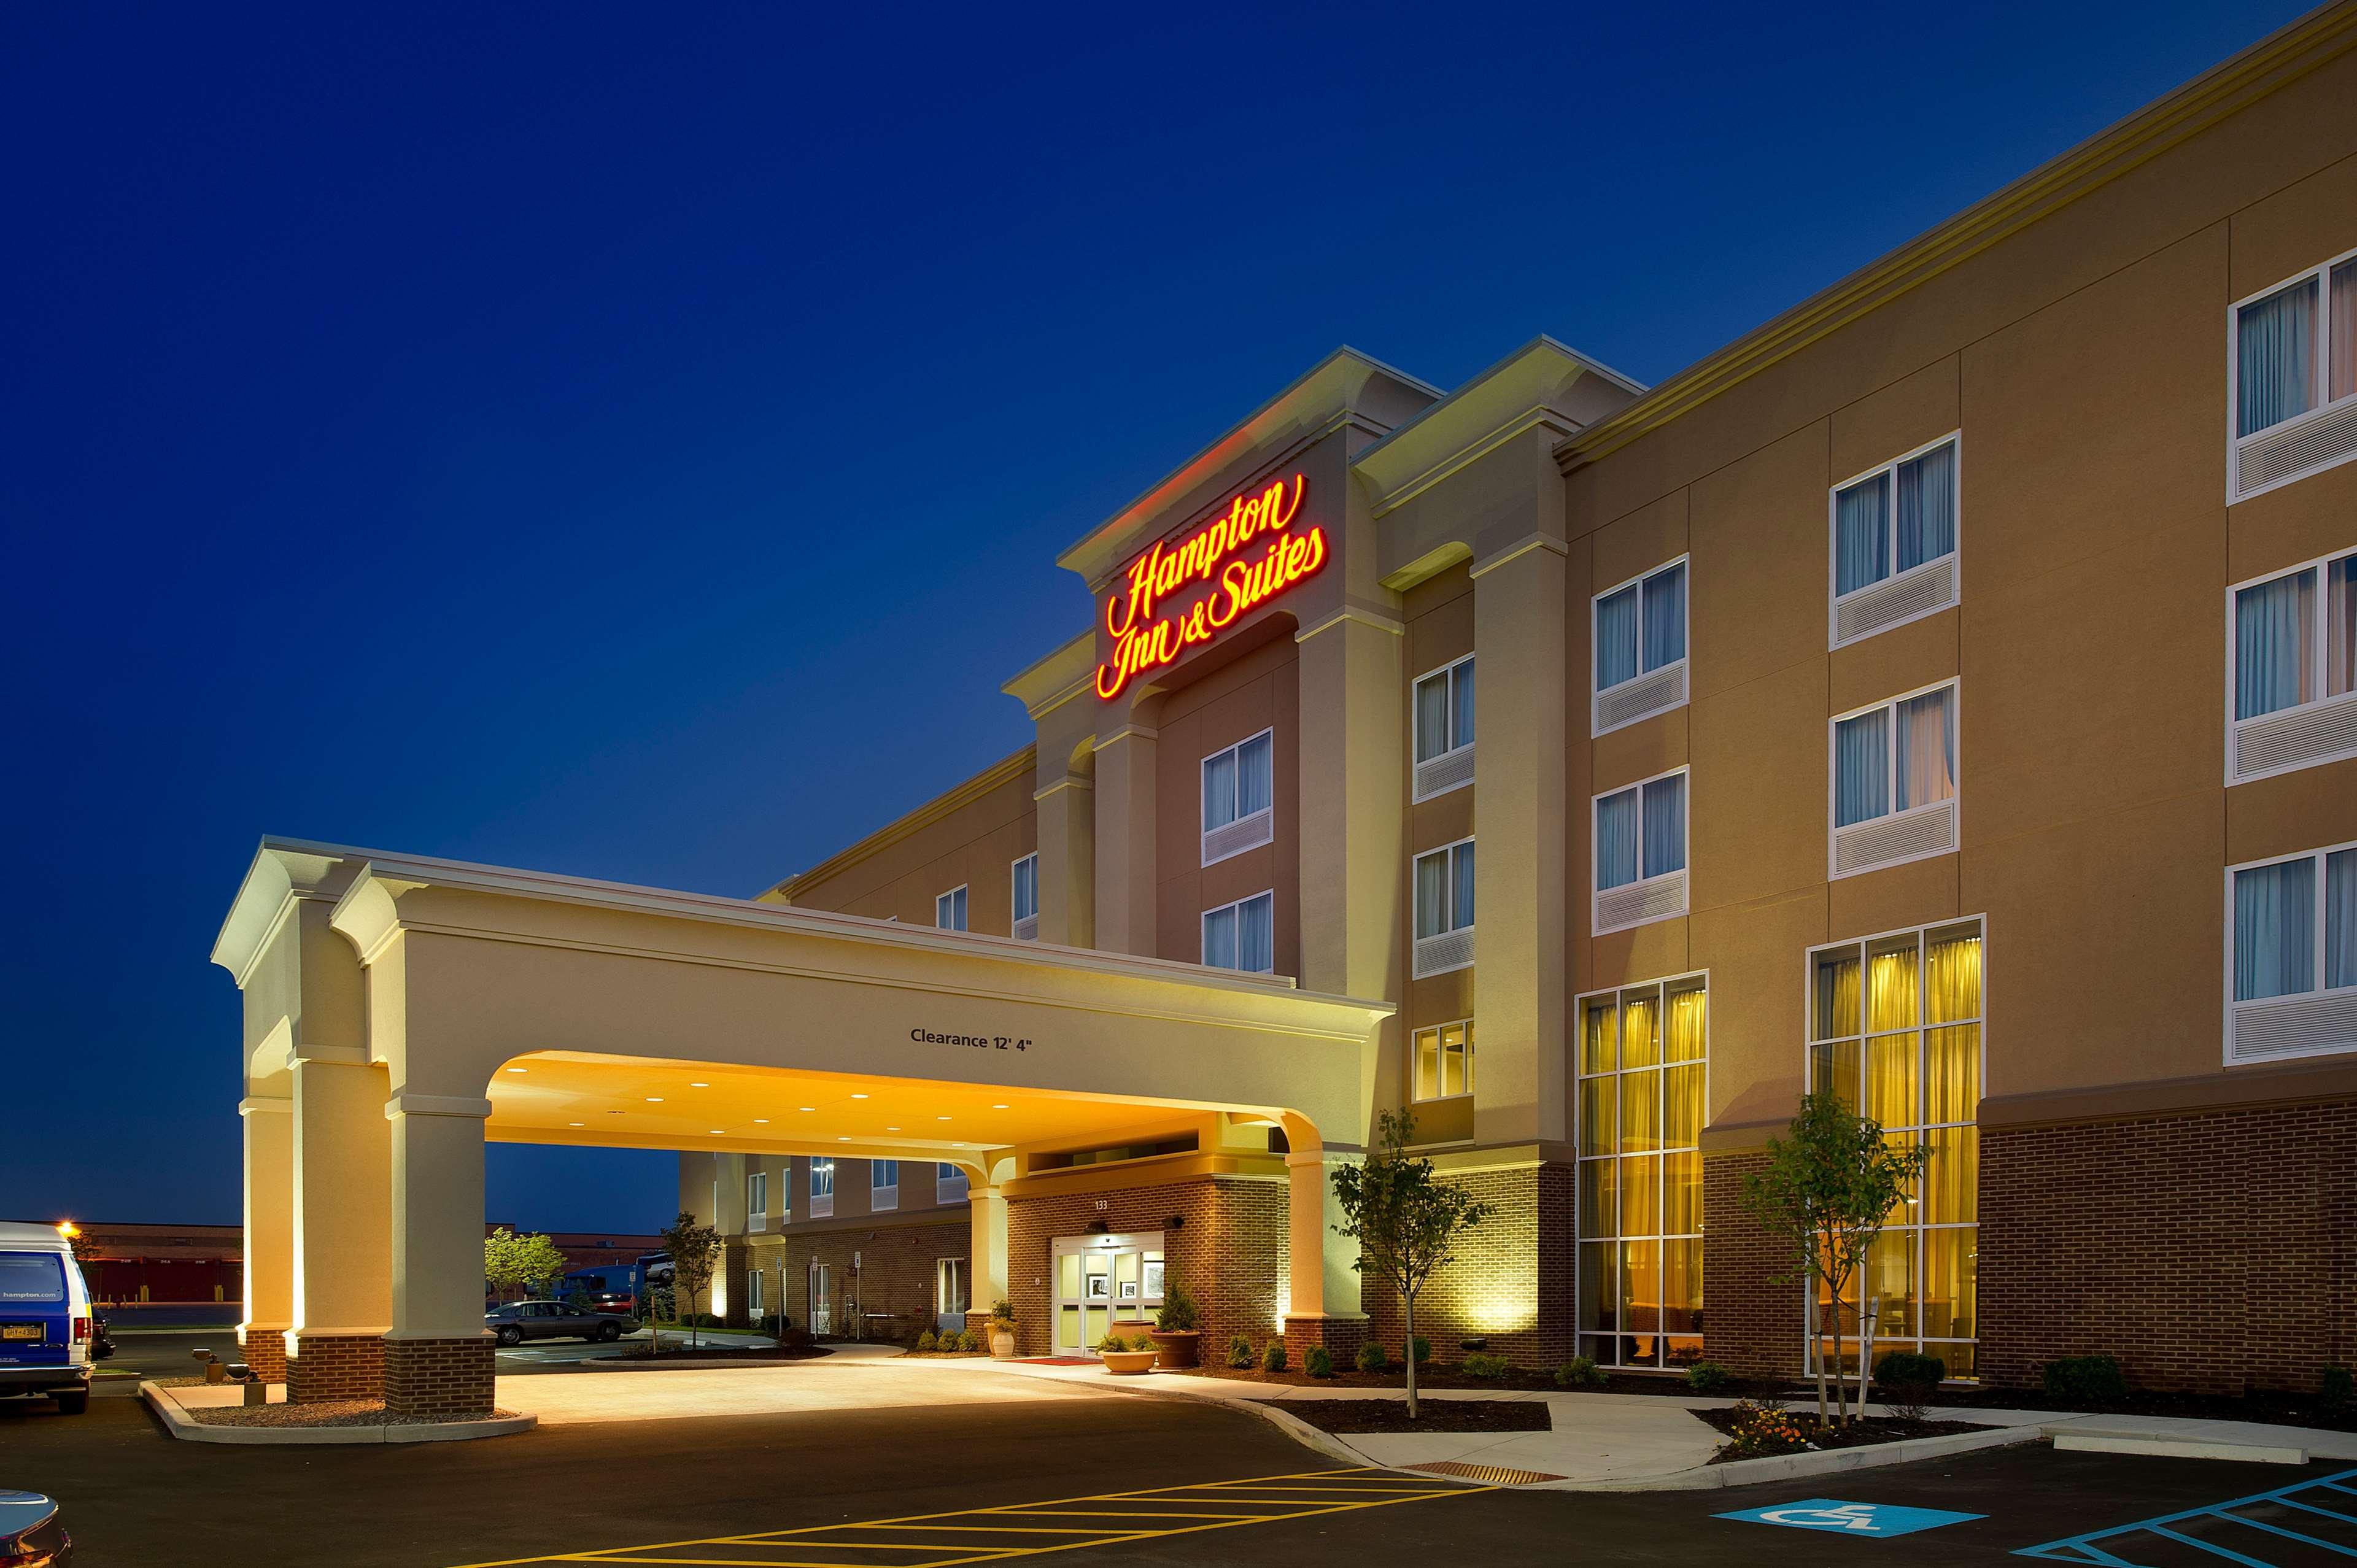 Hampton Inn & Suites Buffalo Airport image 1